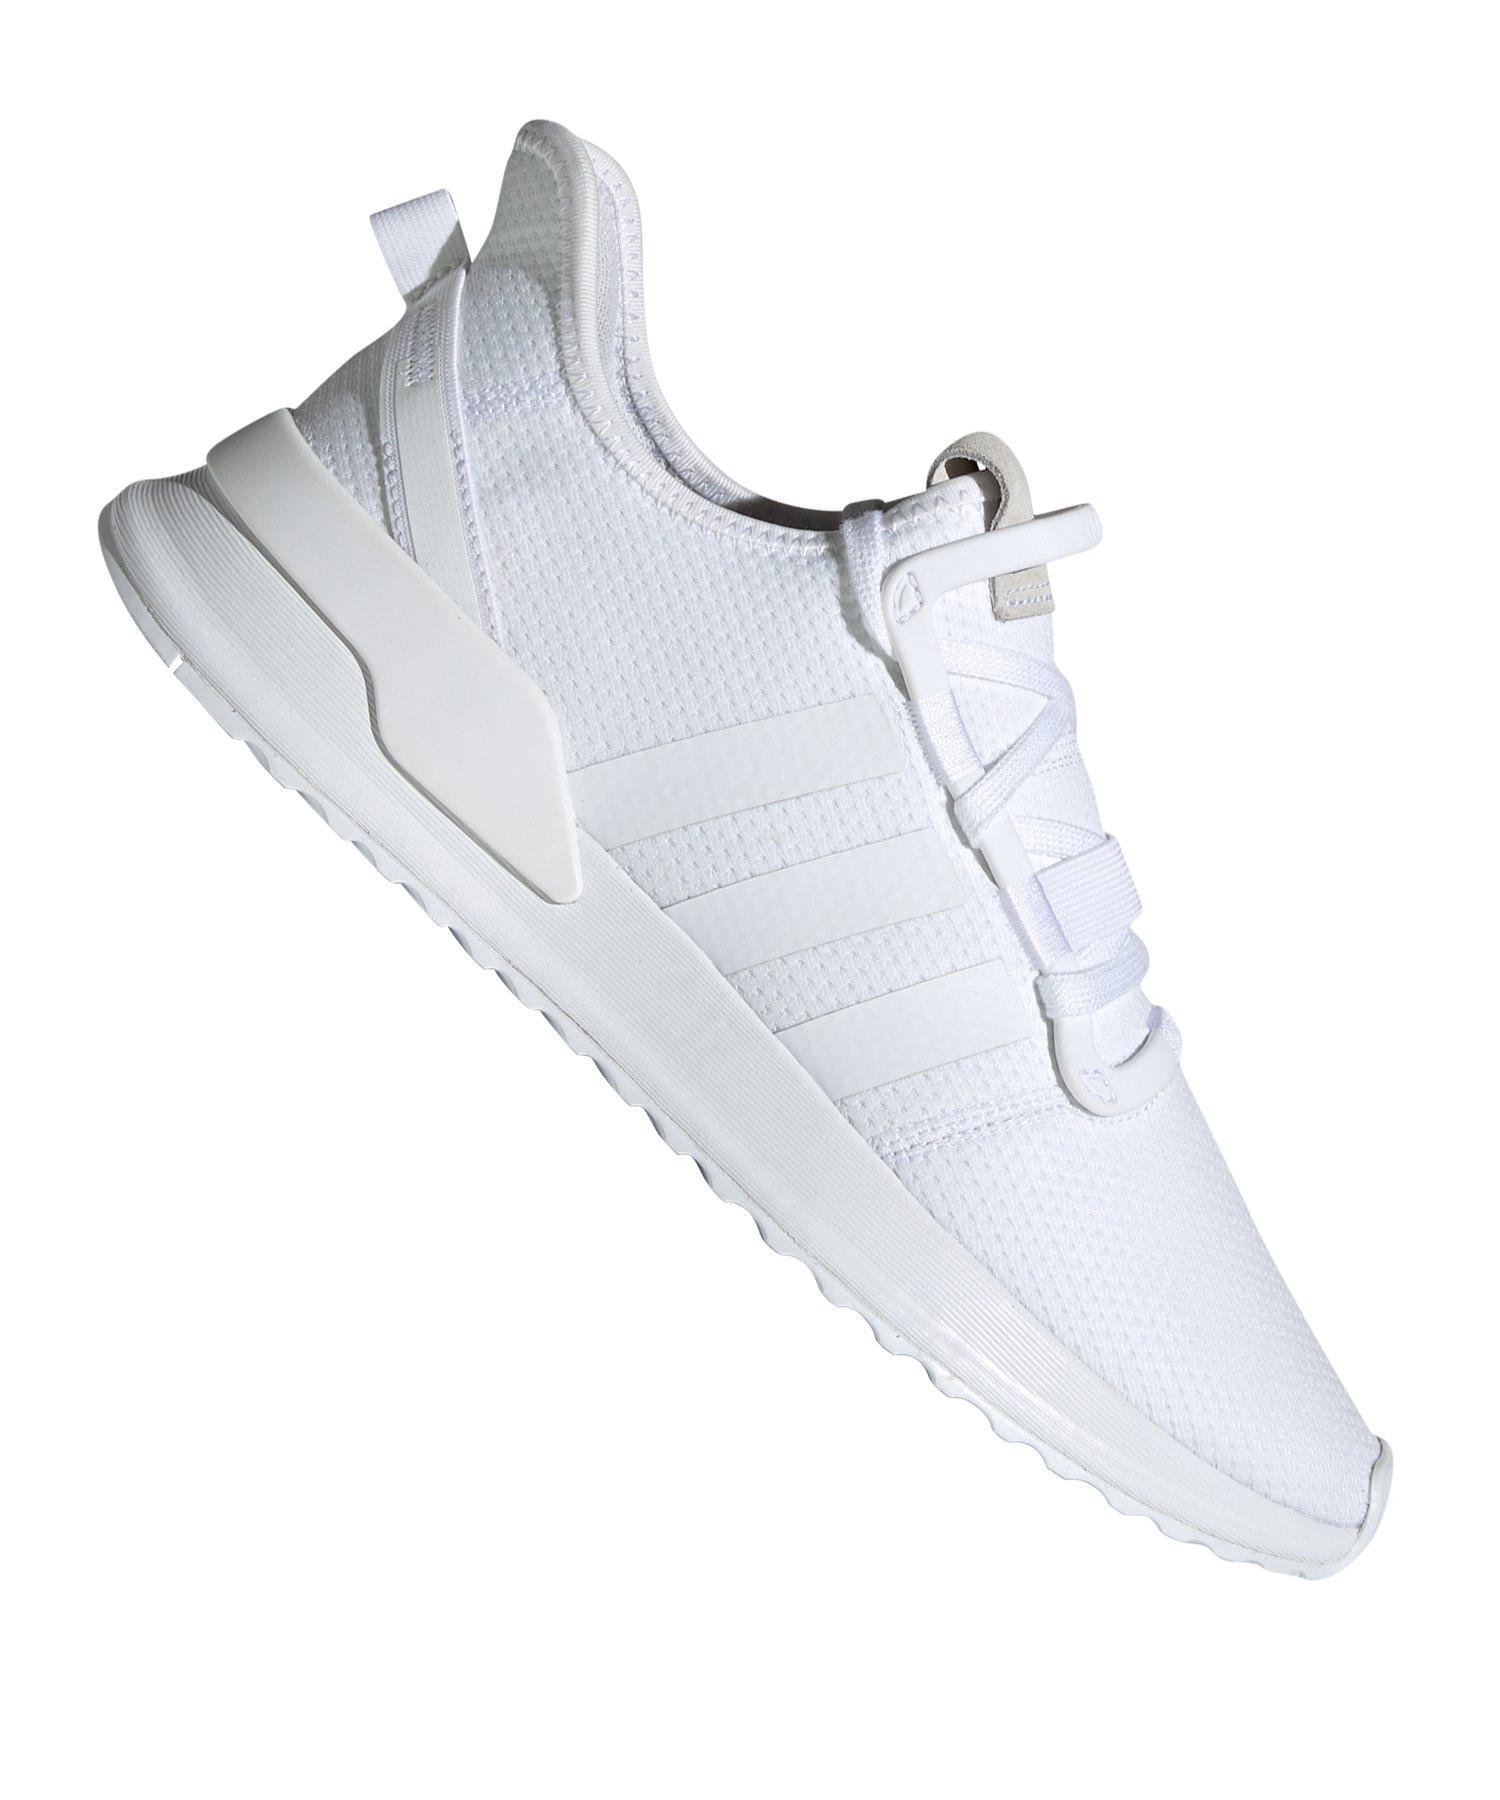 Details zu Neu adidas Originals U_Path Run Schuhe Herren Sneakers Blau Freizeit Fashion